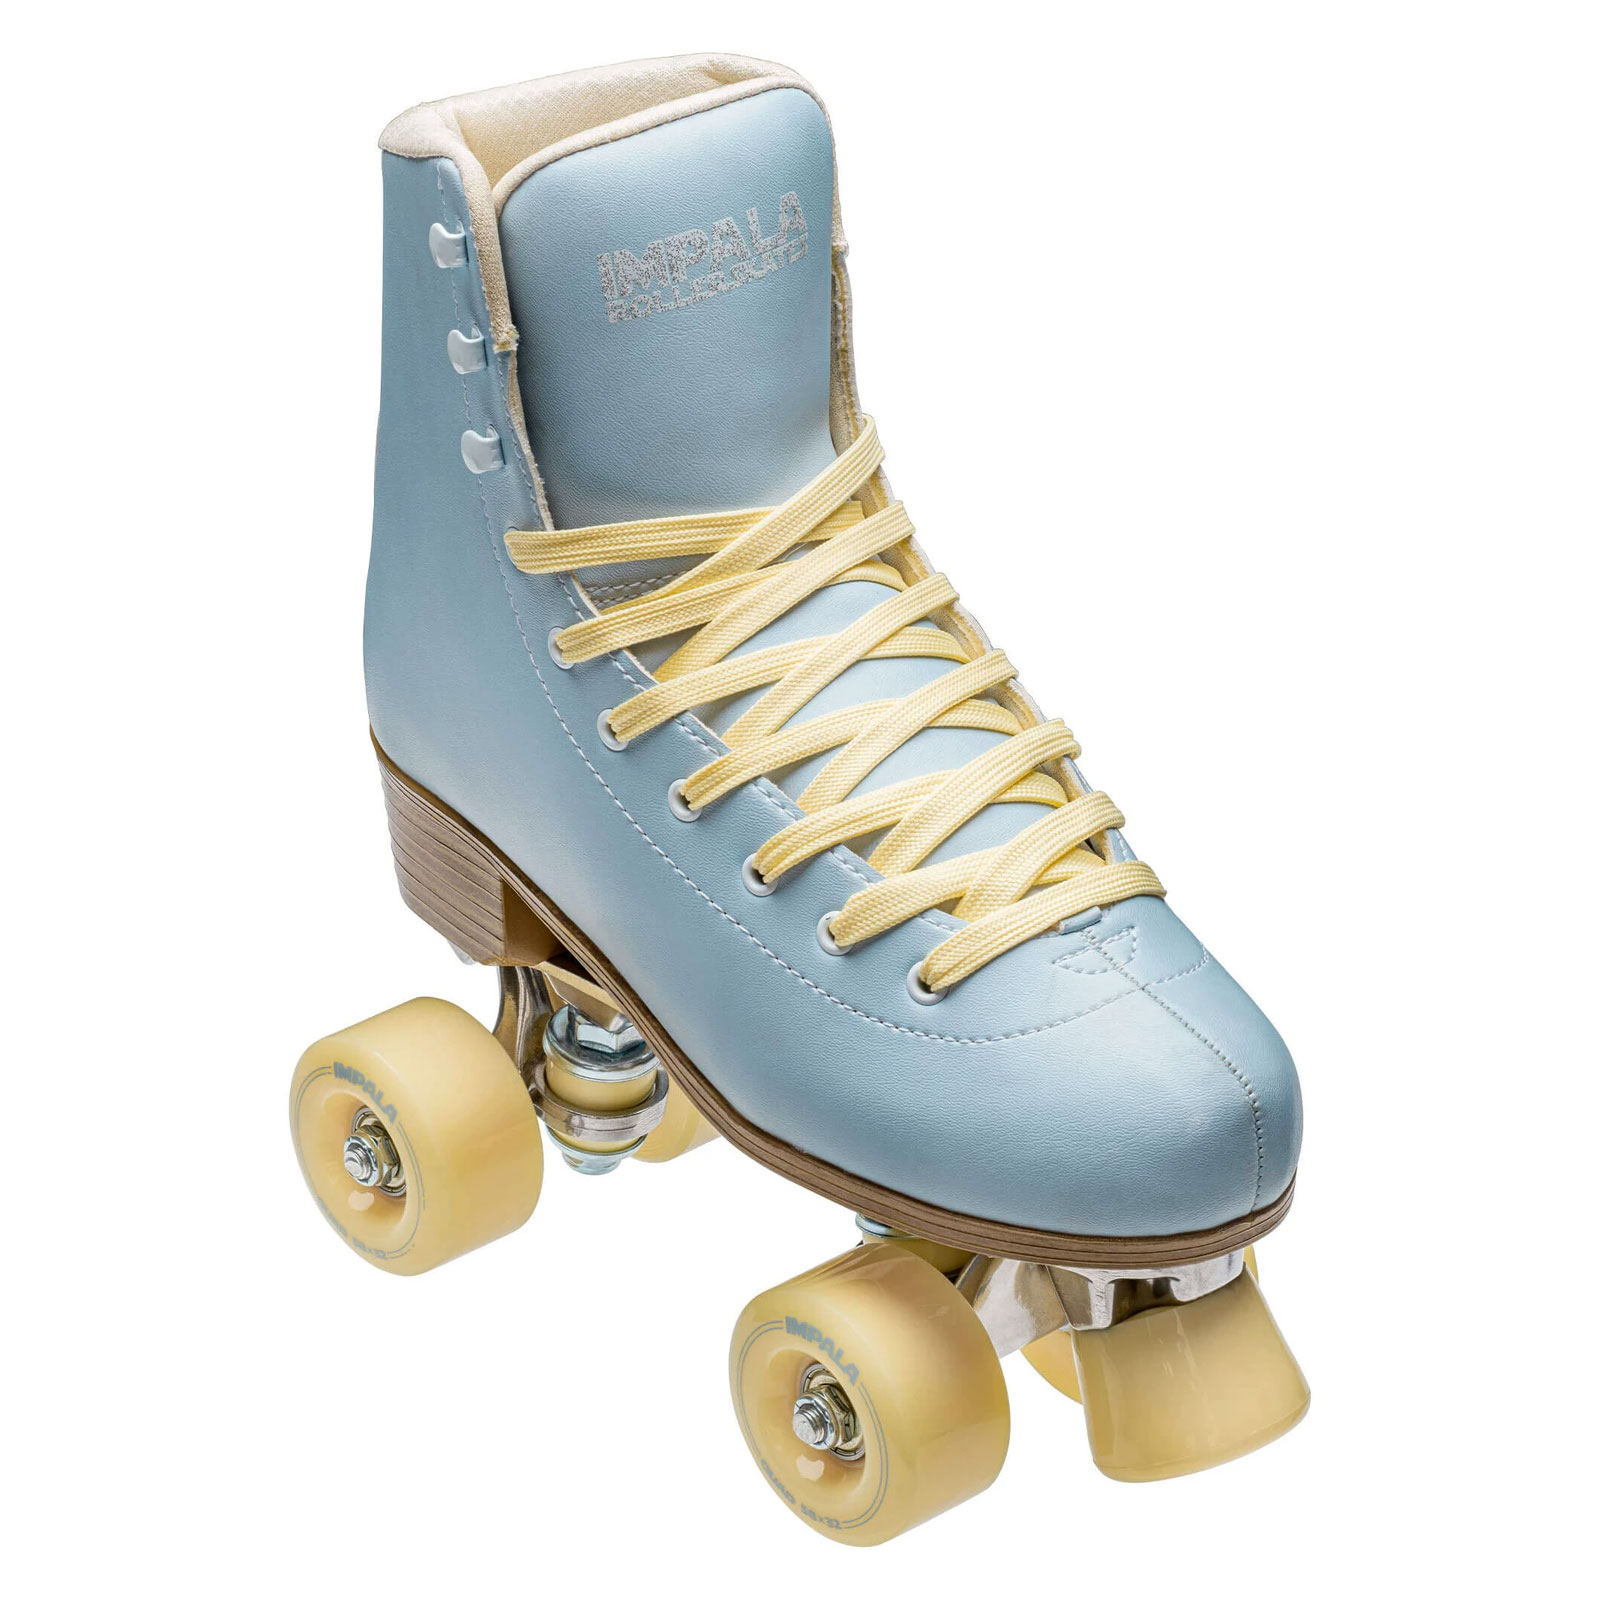 Brand New Impala Quad Sky Blue Roller Skates IN HAND